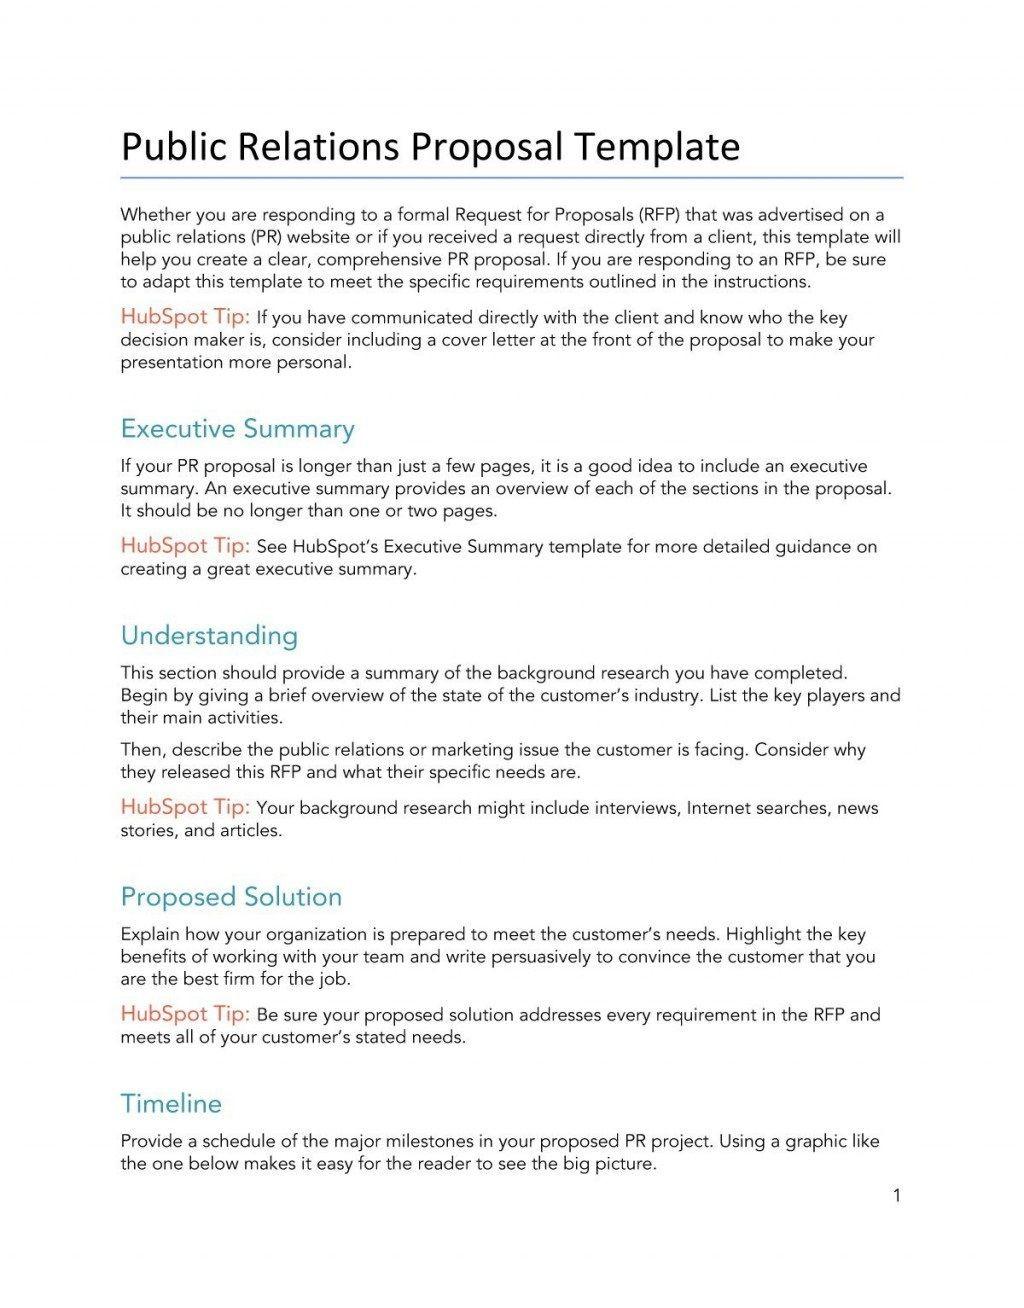 001 Amazing Public Relation Strategy Plan Template Image  ExampleLarge